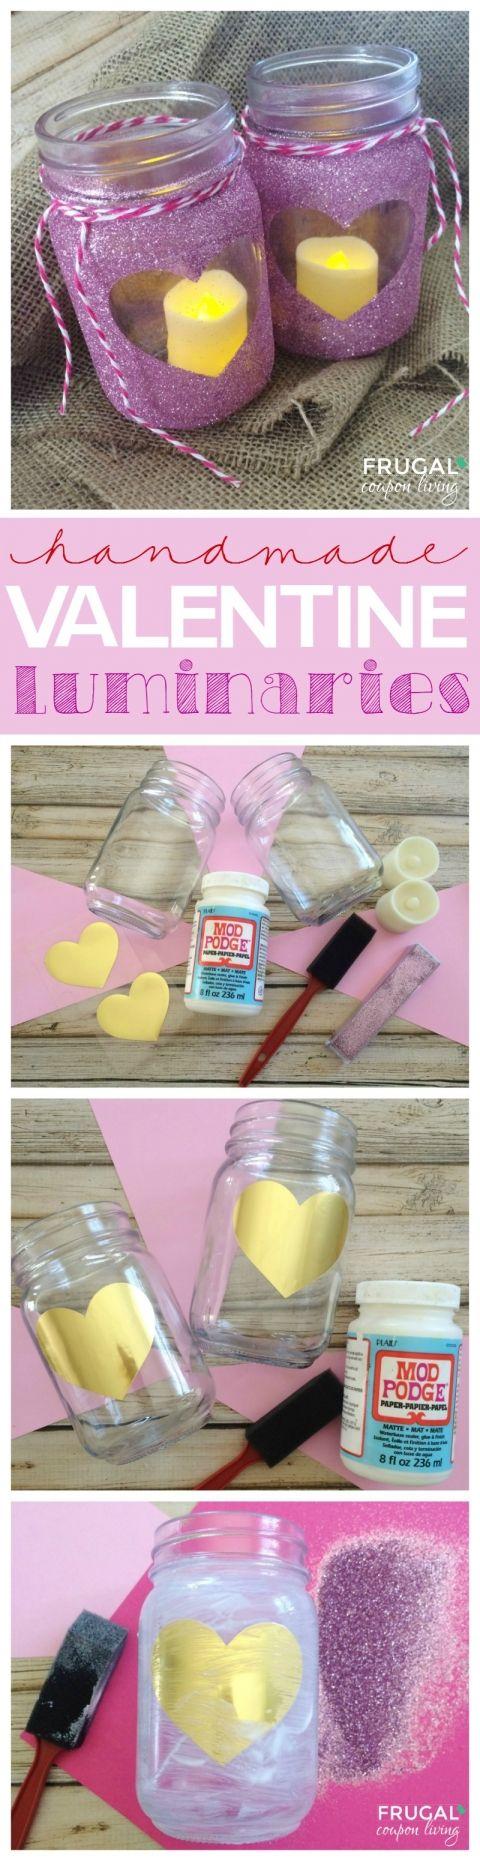 handmade-valentine-luminaries-Collage-frugal-coupon-living